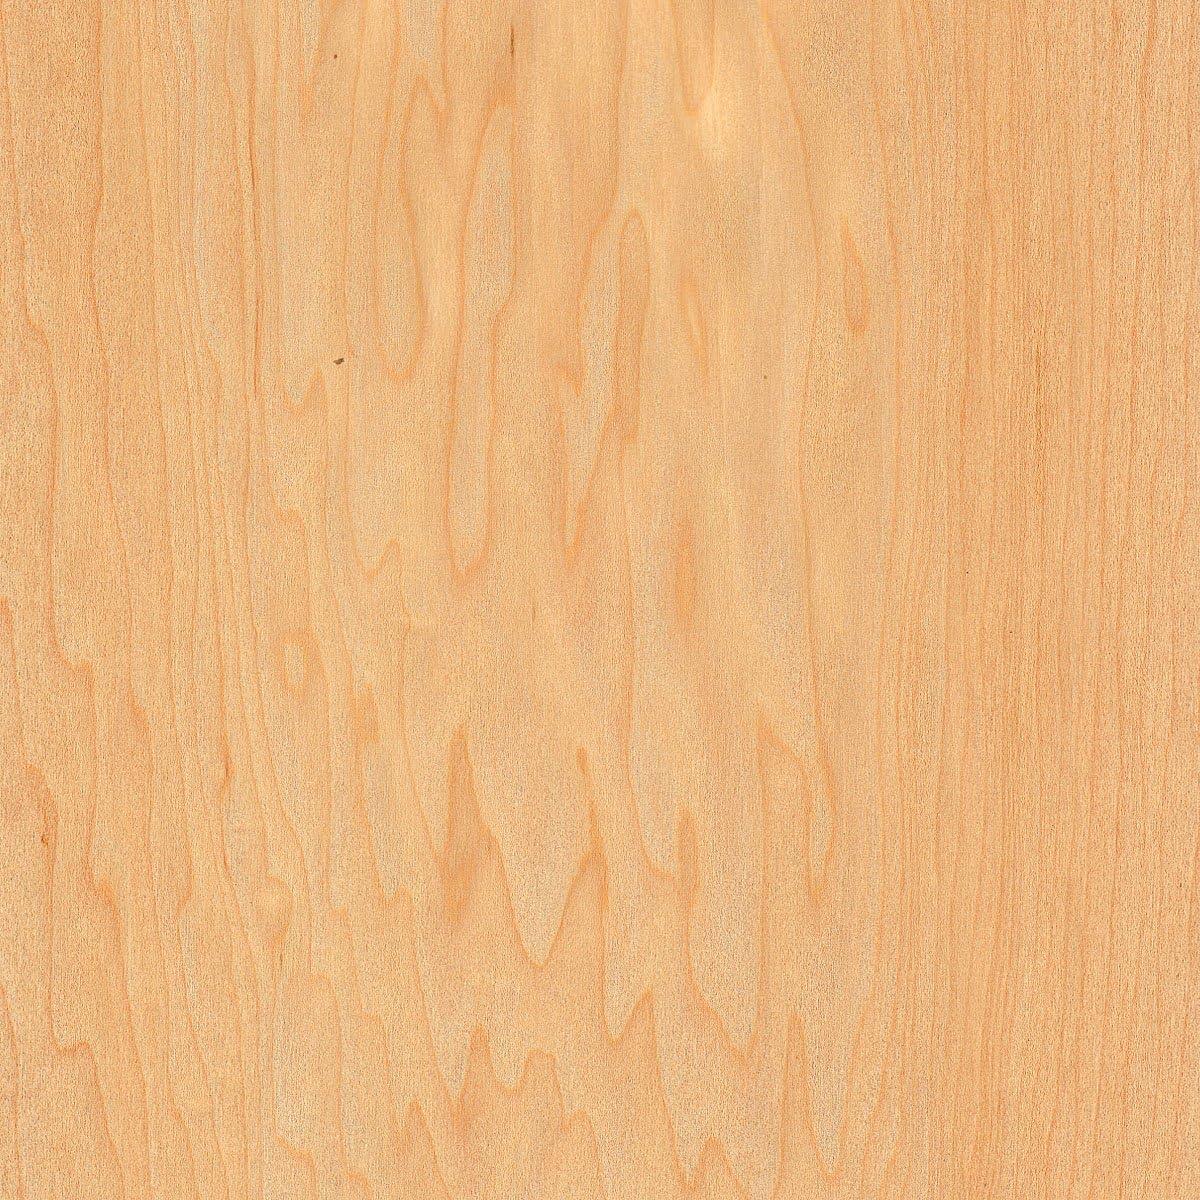 Wood-All Maple Wood Veneer Very popular Cheap SALE Start Sheet Rotary Cut Whole - Piece Face